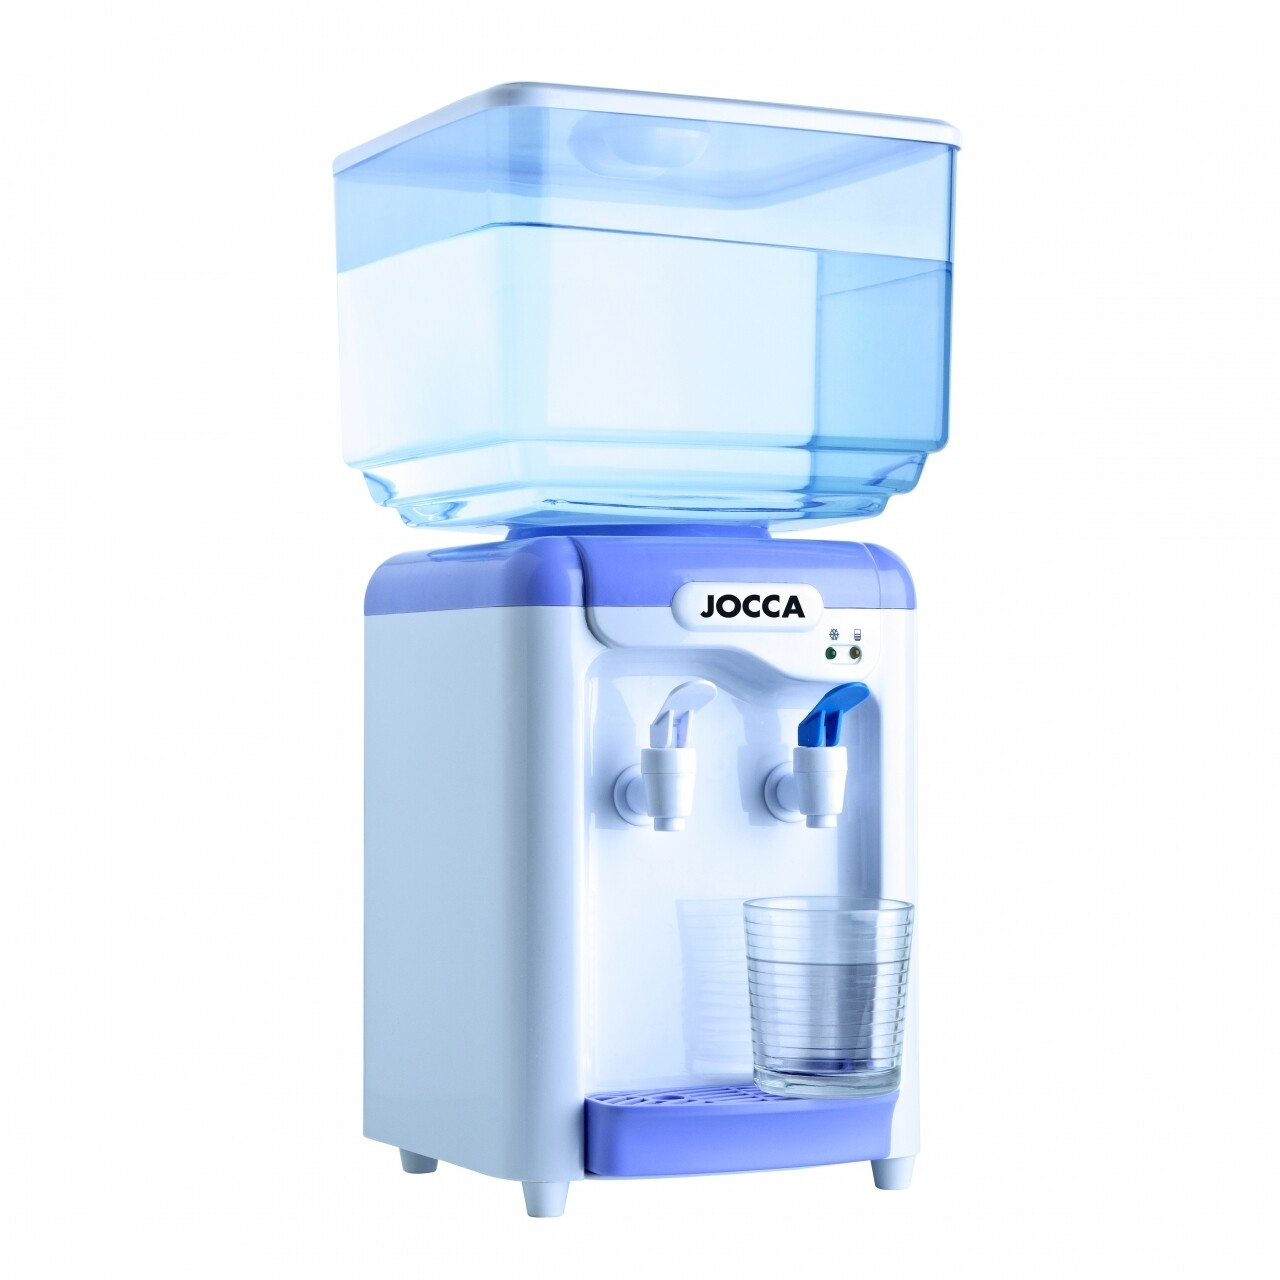 Dozator de apa Jocca, 22 x 20 x 29 cm, ABS si PP, alb